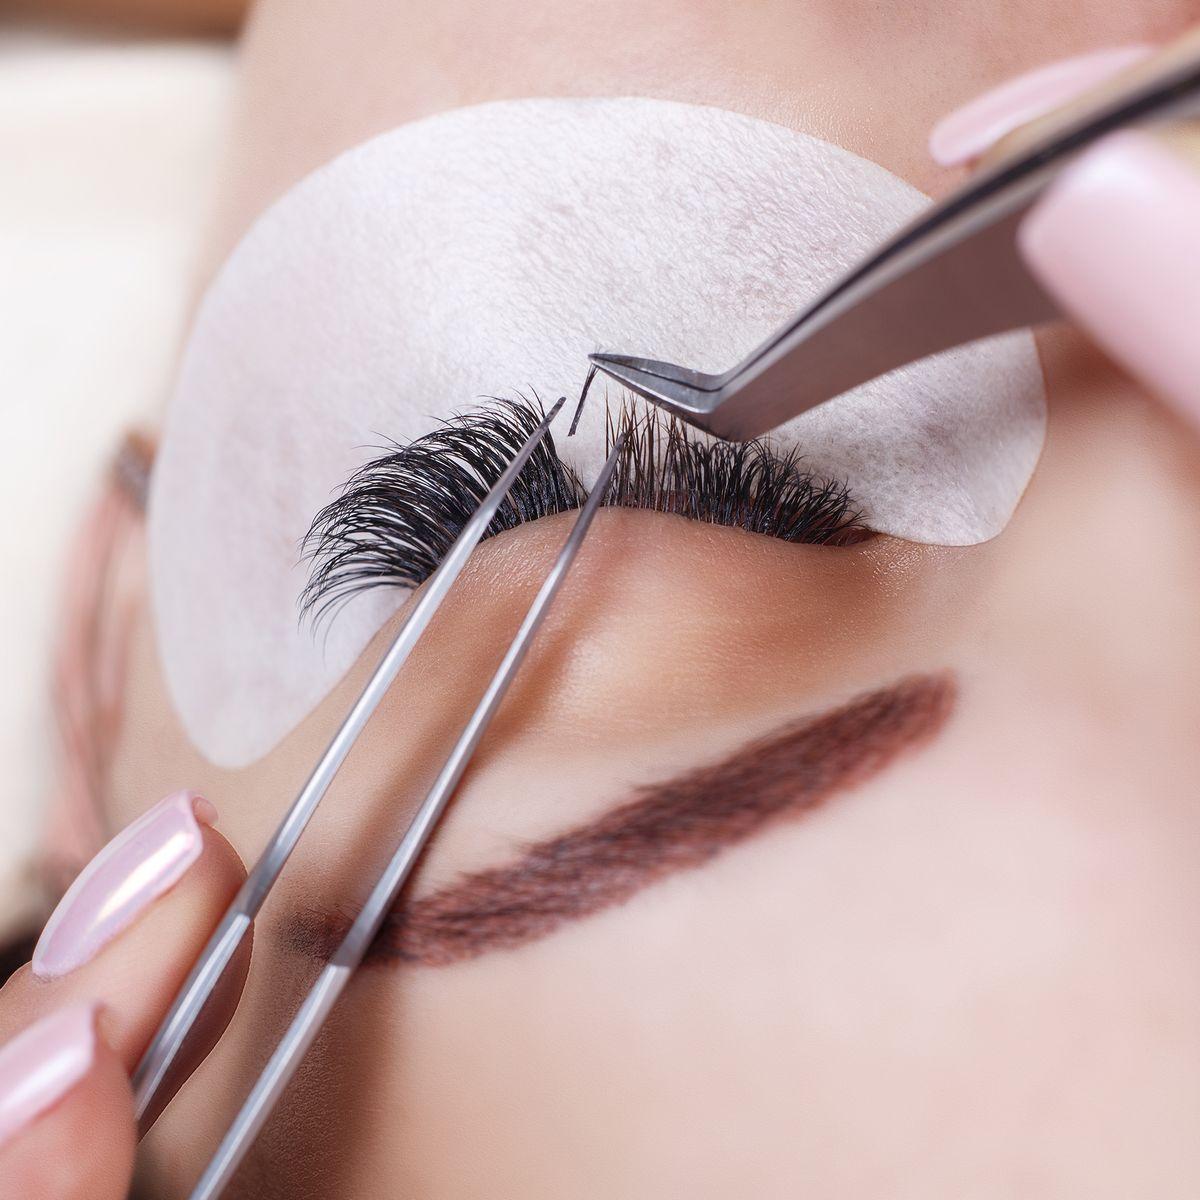 Eyelash Extensions: How Long Do Eyelash Extensions Last?